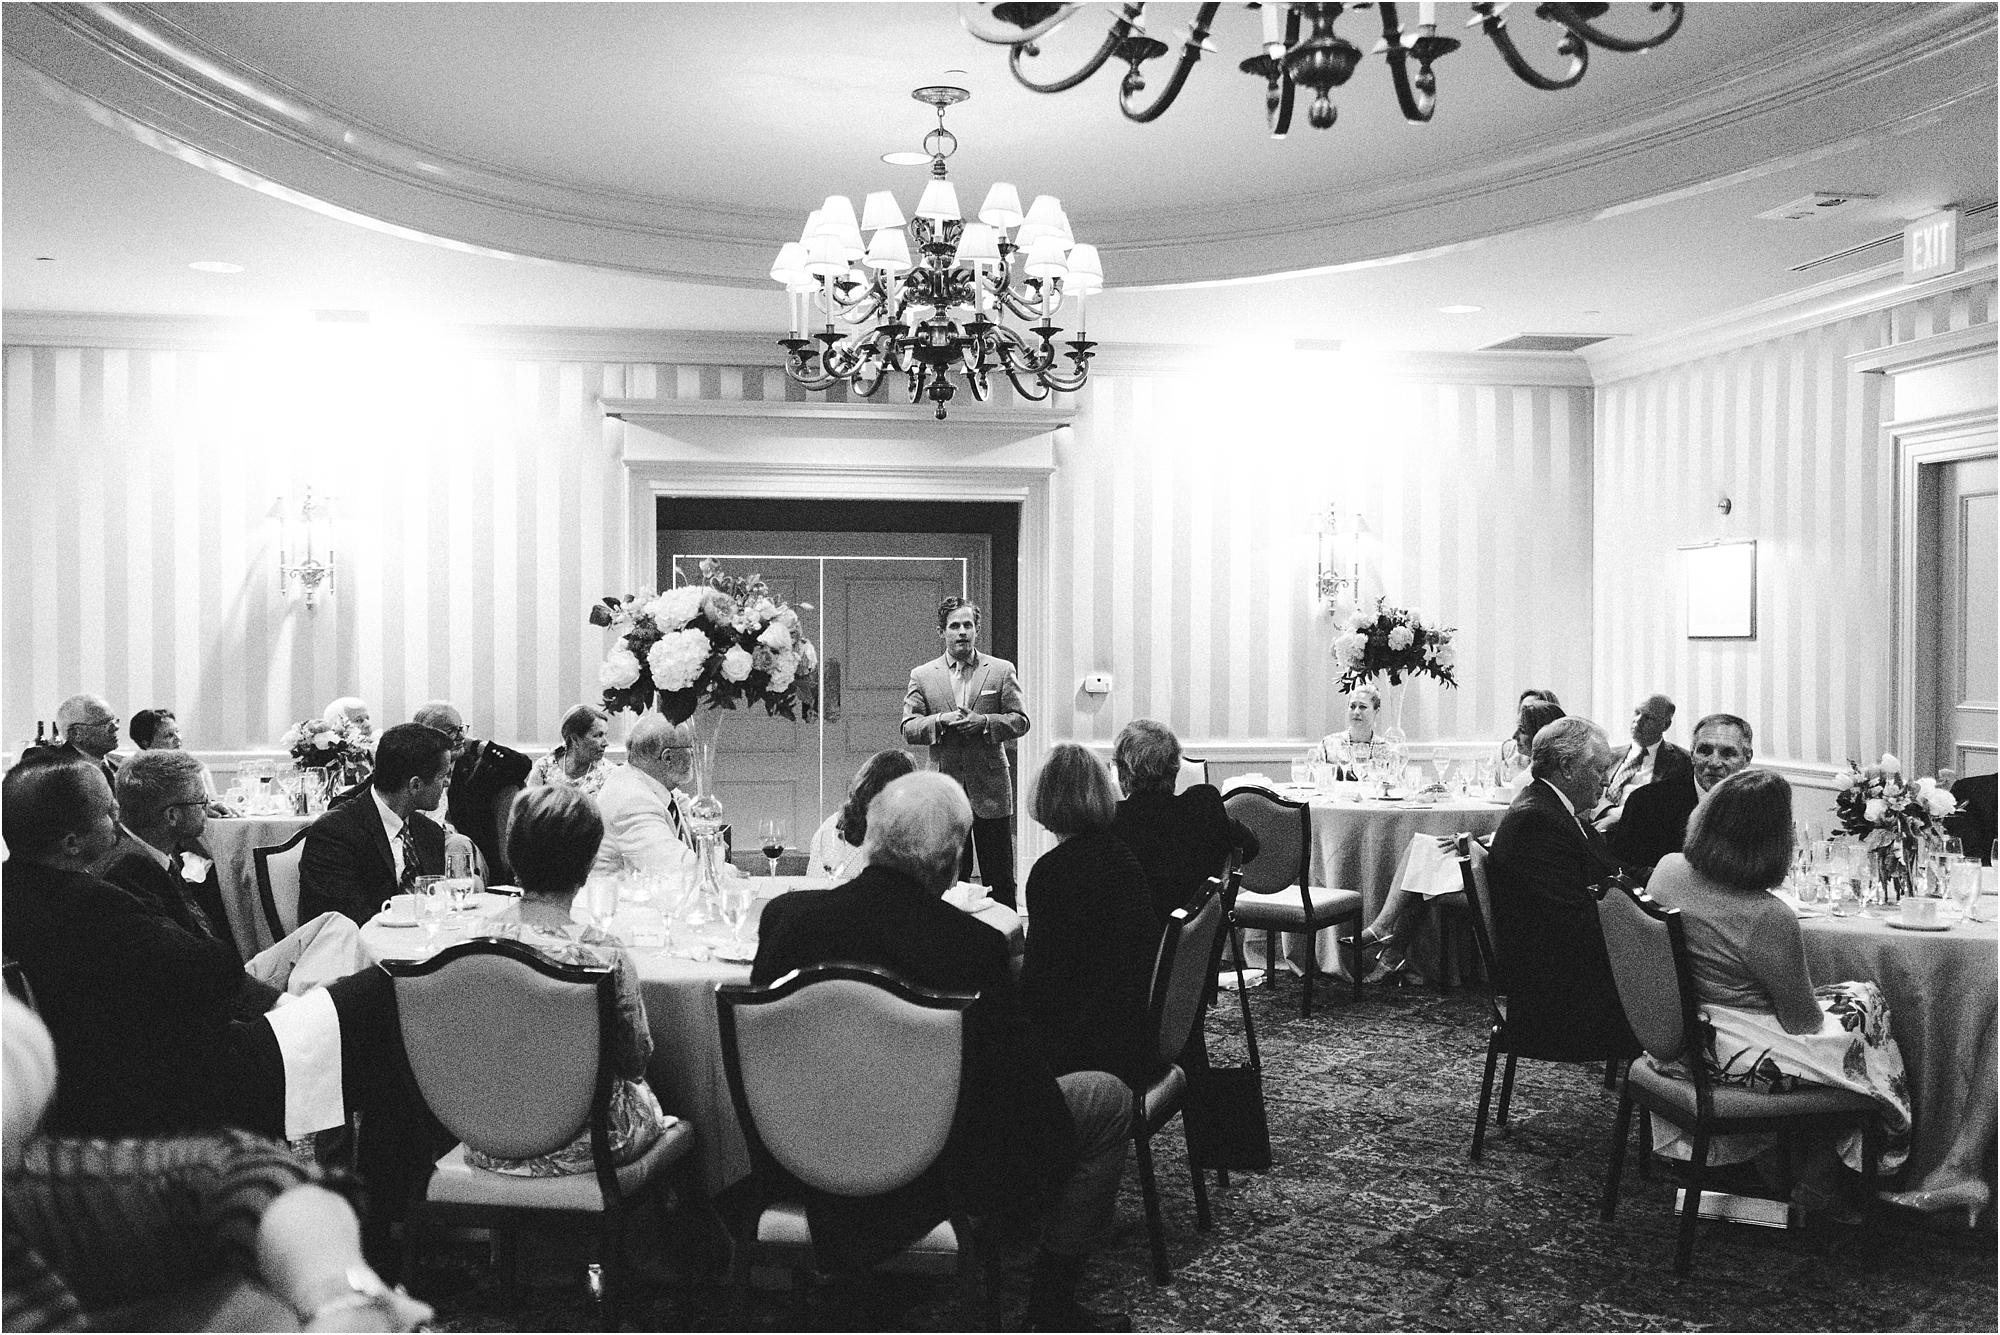 stephanie-yonce-photography-chic-historic-home-wedding-richmond-virginia-photos_0032.jpg